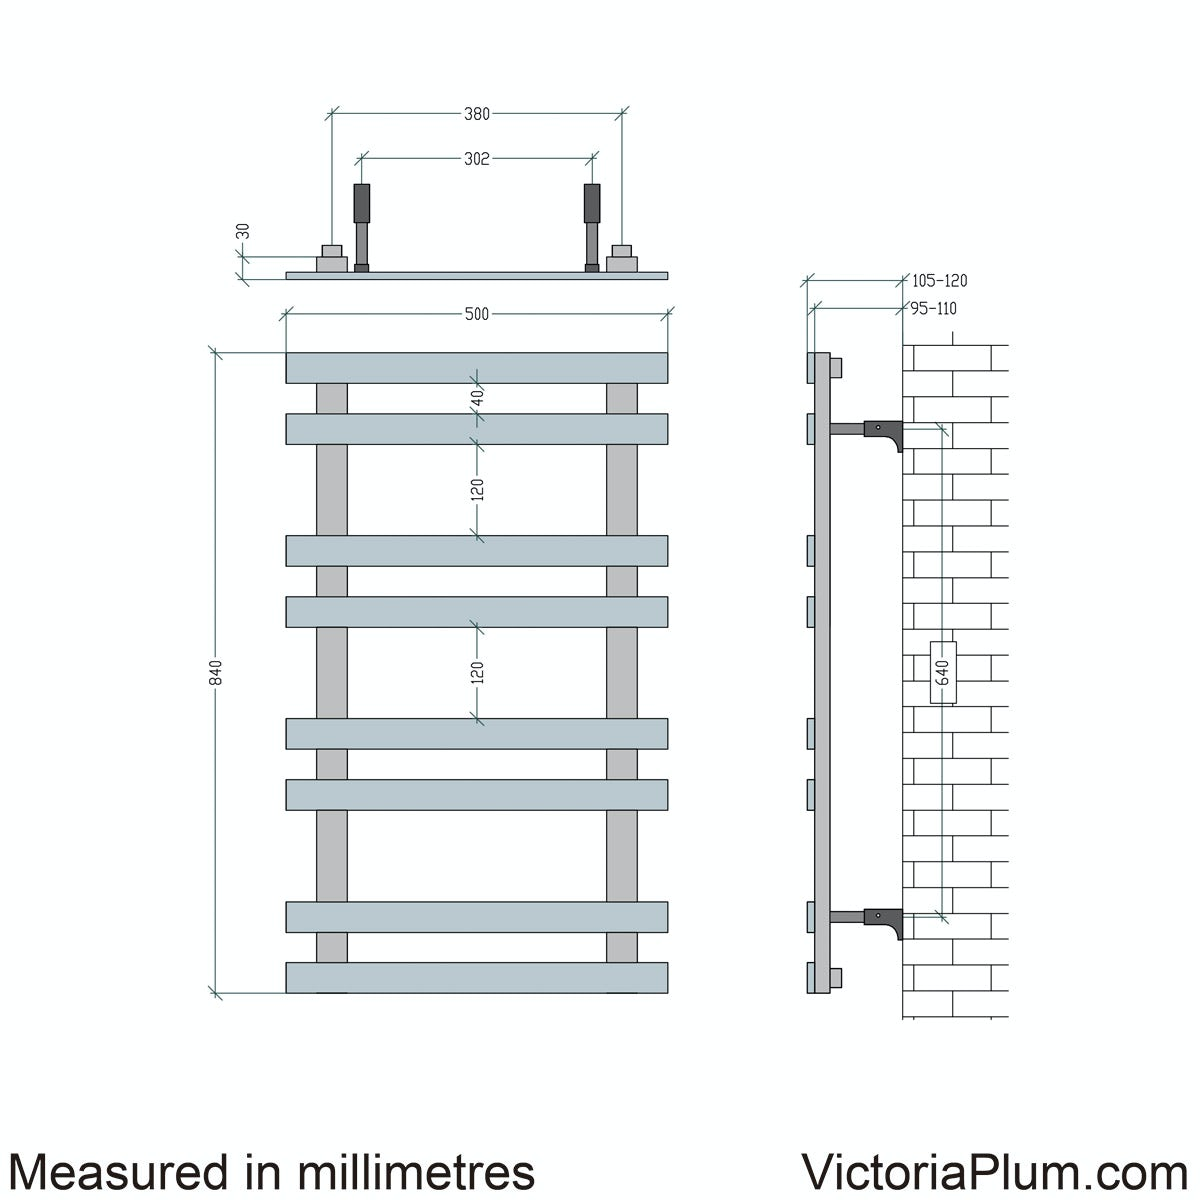 Dimensions for Mode Daisy 8 bar heated towel rail 840 x 500